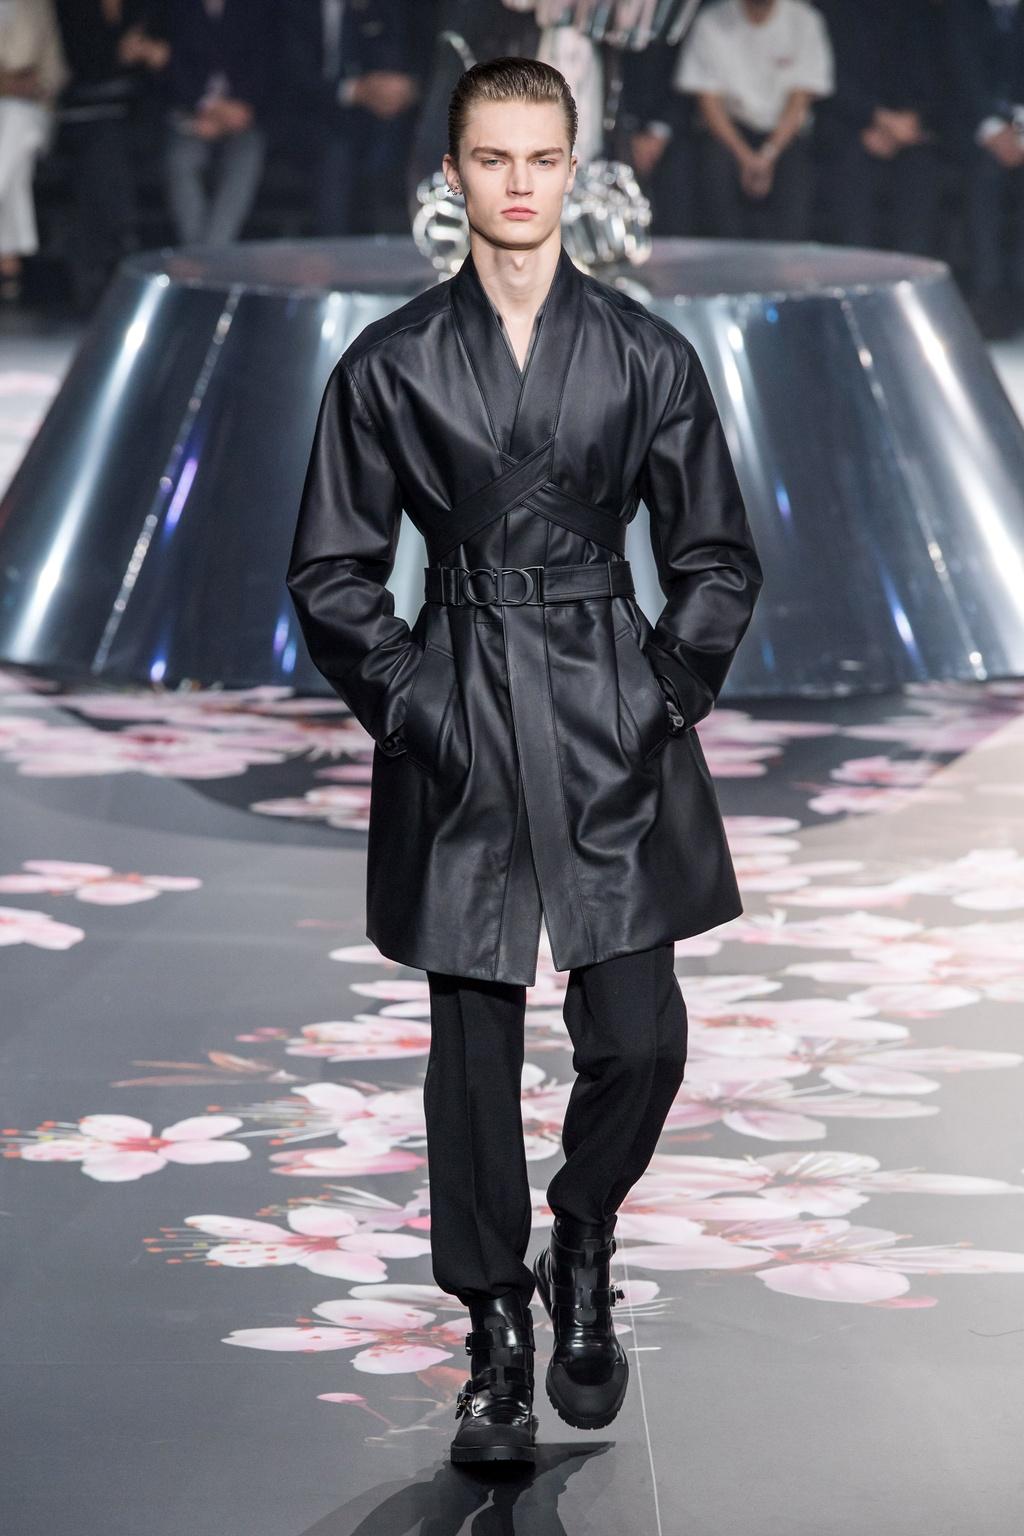 Show dien Dior gay sot voi phu kien giong bao dung sung hinh anh 11